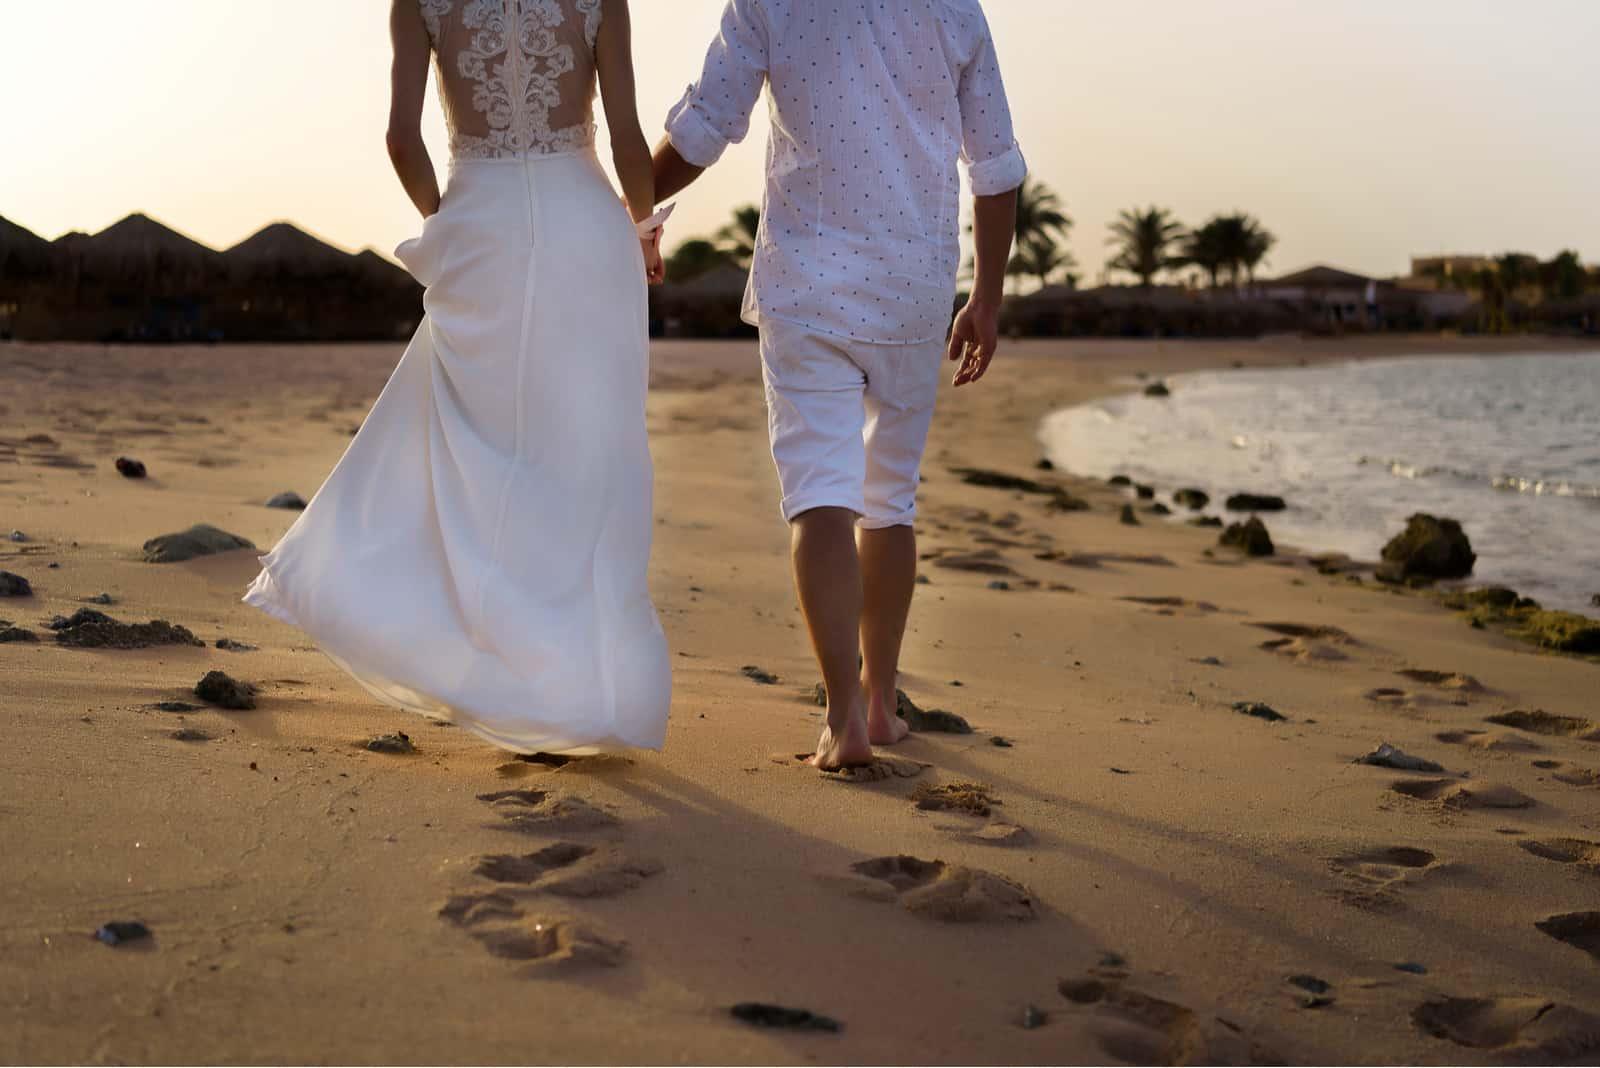 Frischvermählte gehen bei Sonnenuntergang am Strand entlang